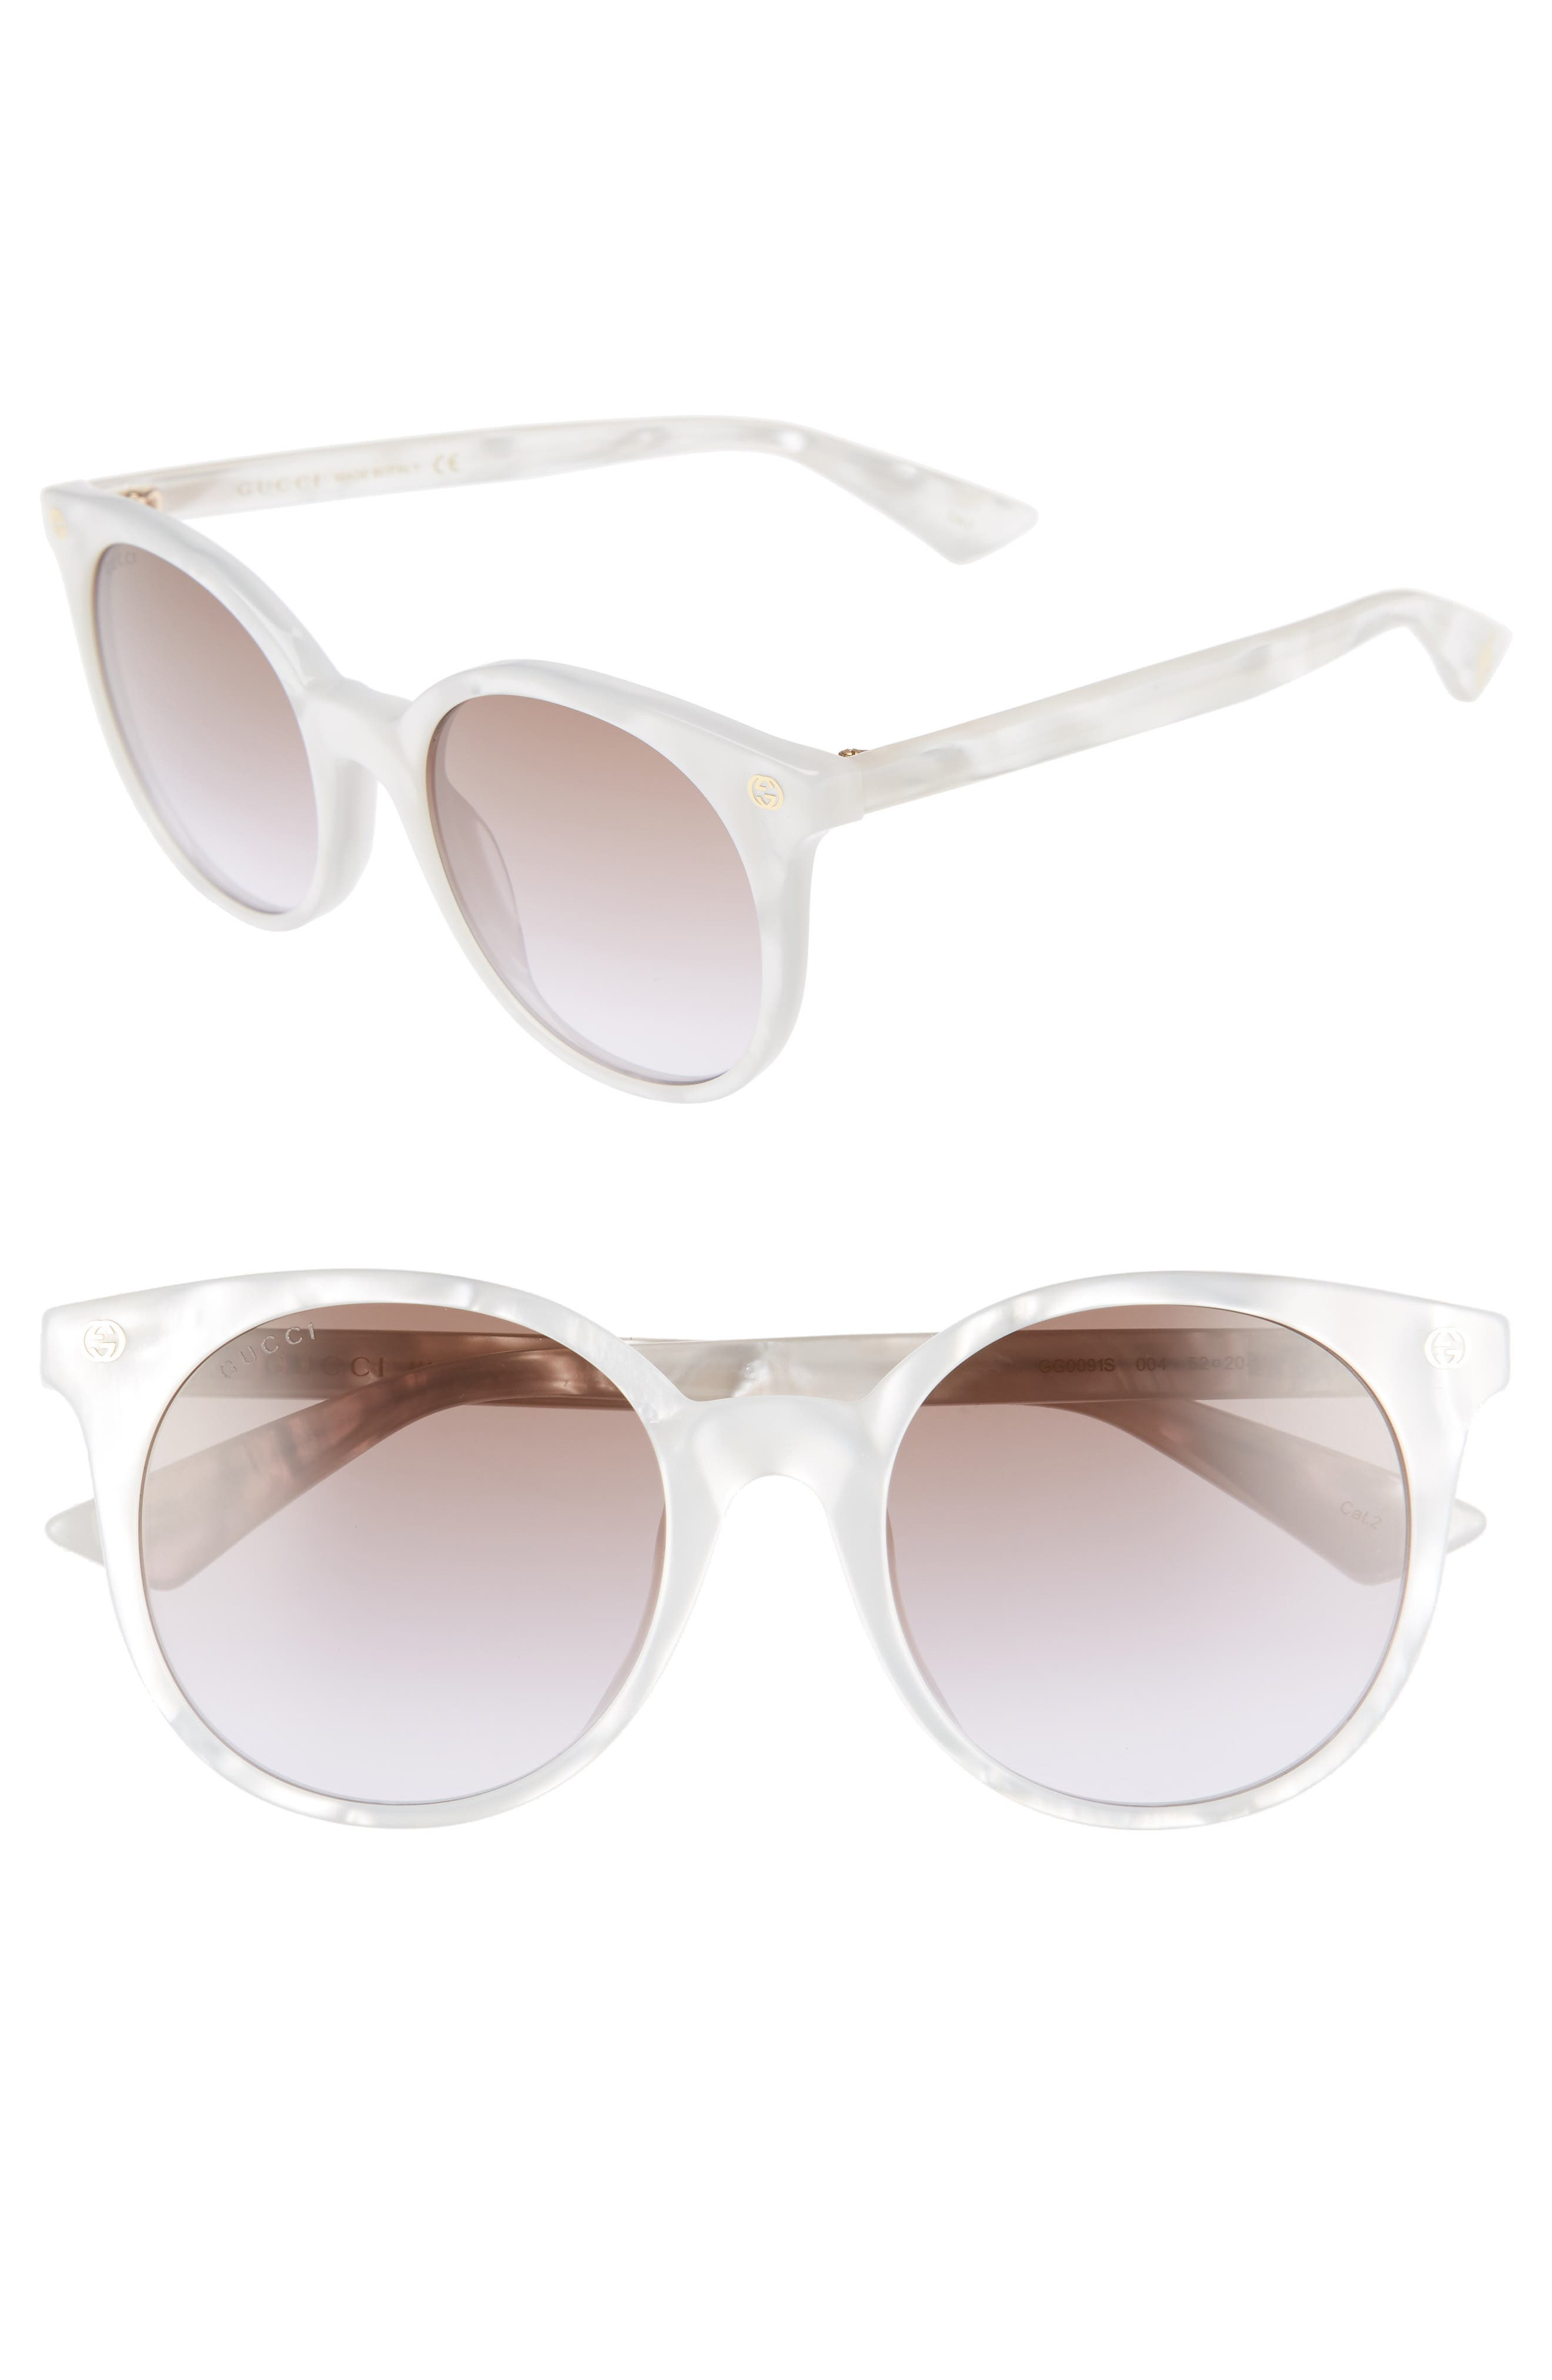 52mm Round Sunglasses,                             Main thumbnail 2, color,